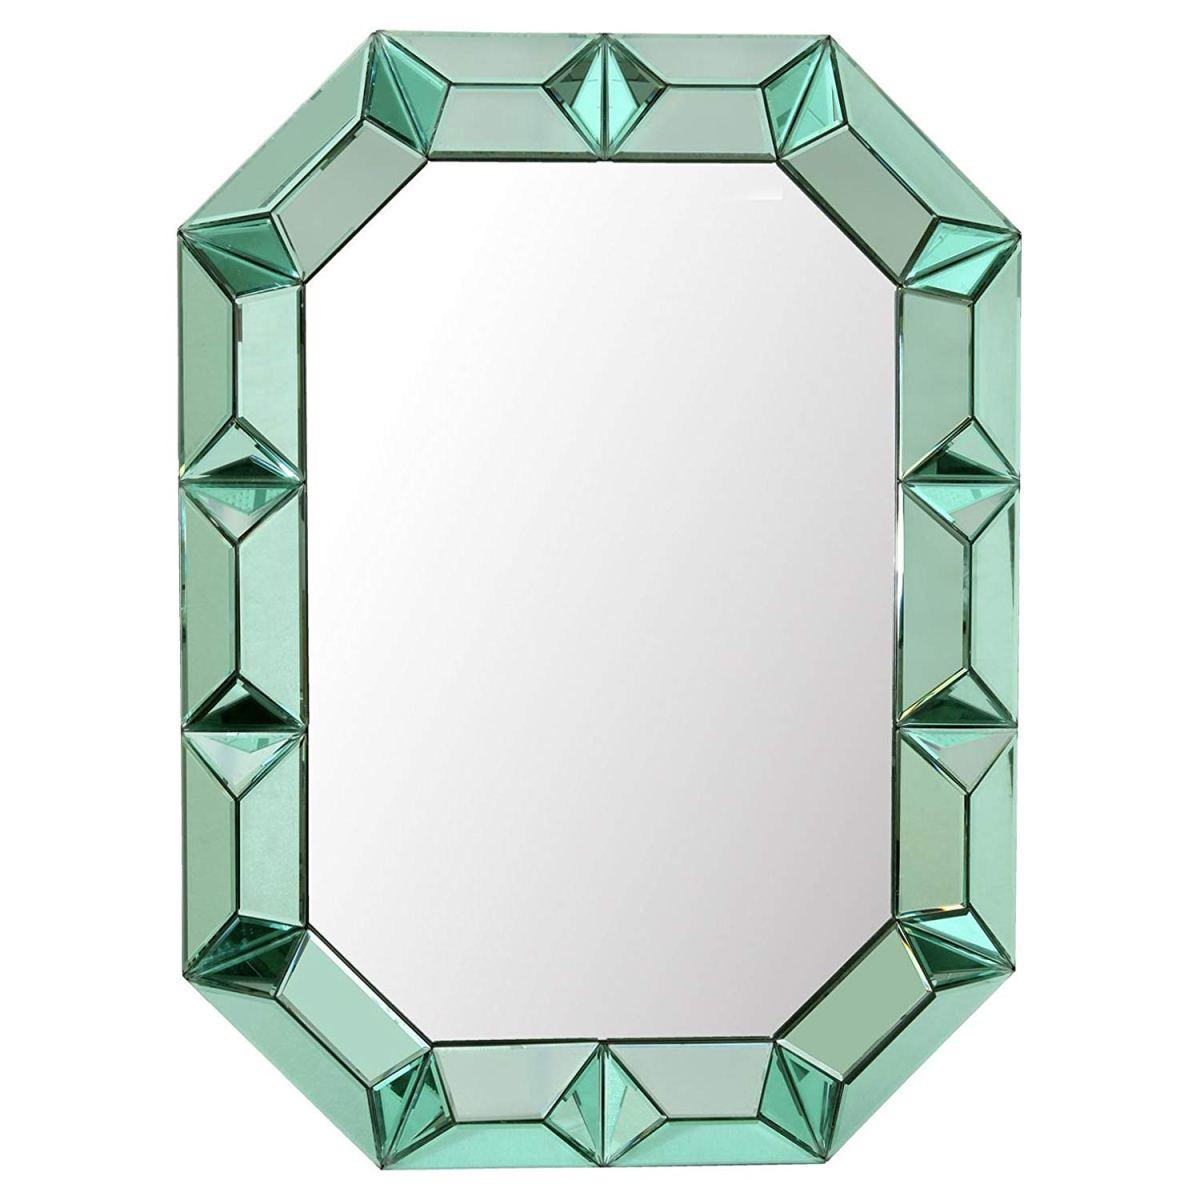 green mirror, colorful mirror, hollywood regency mirror